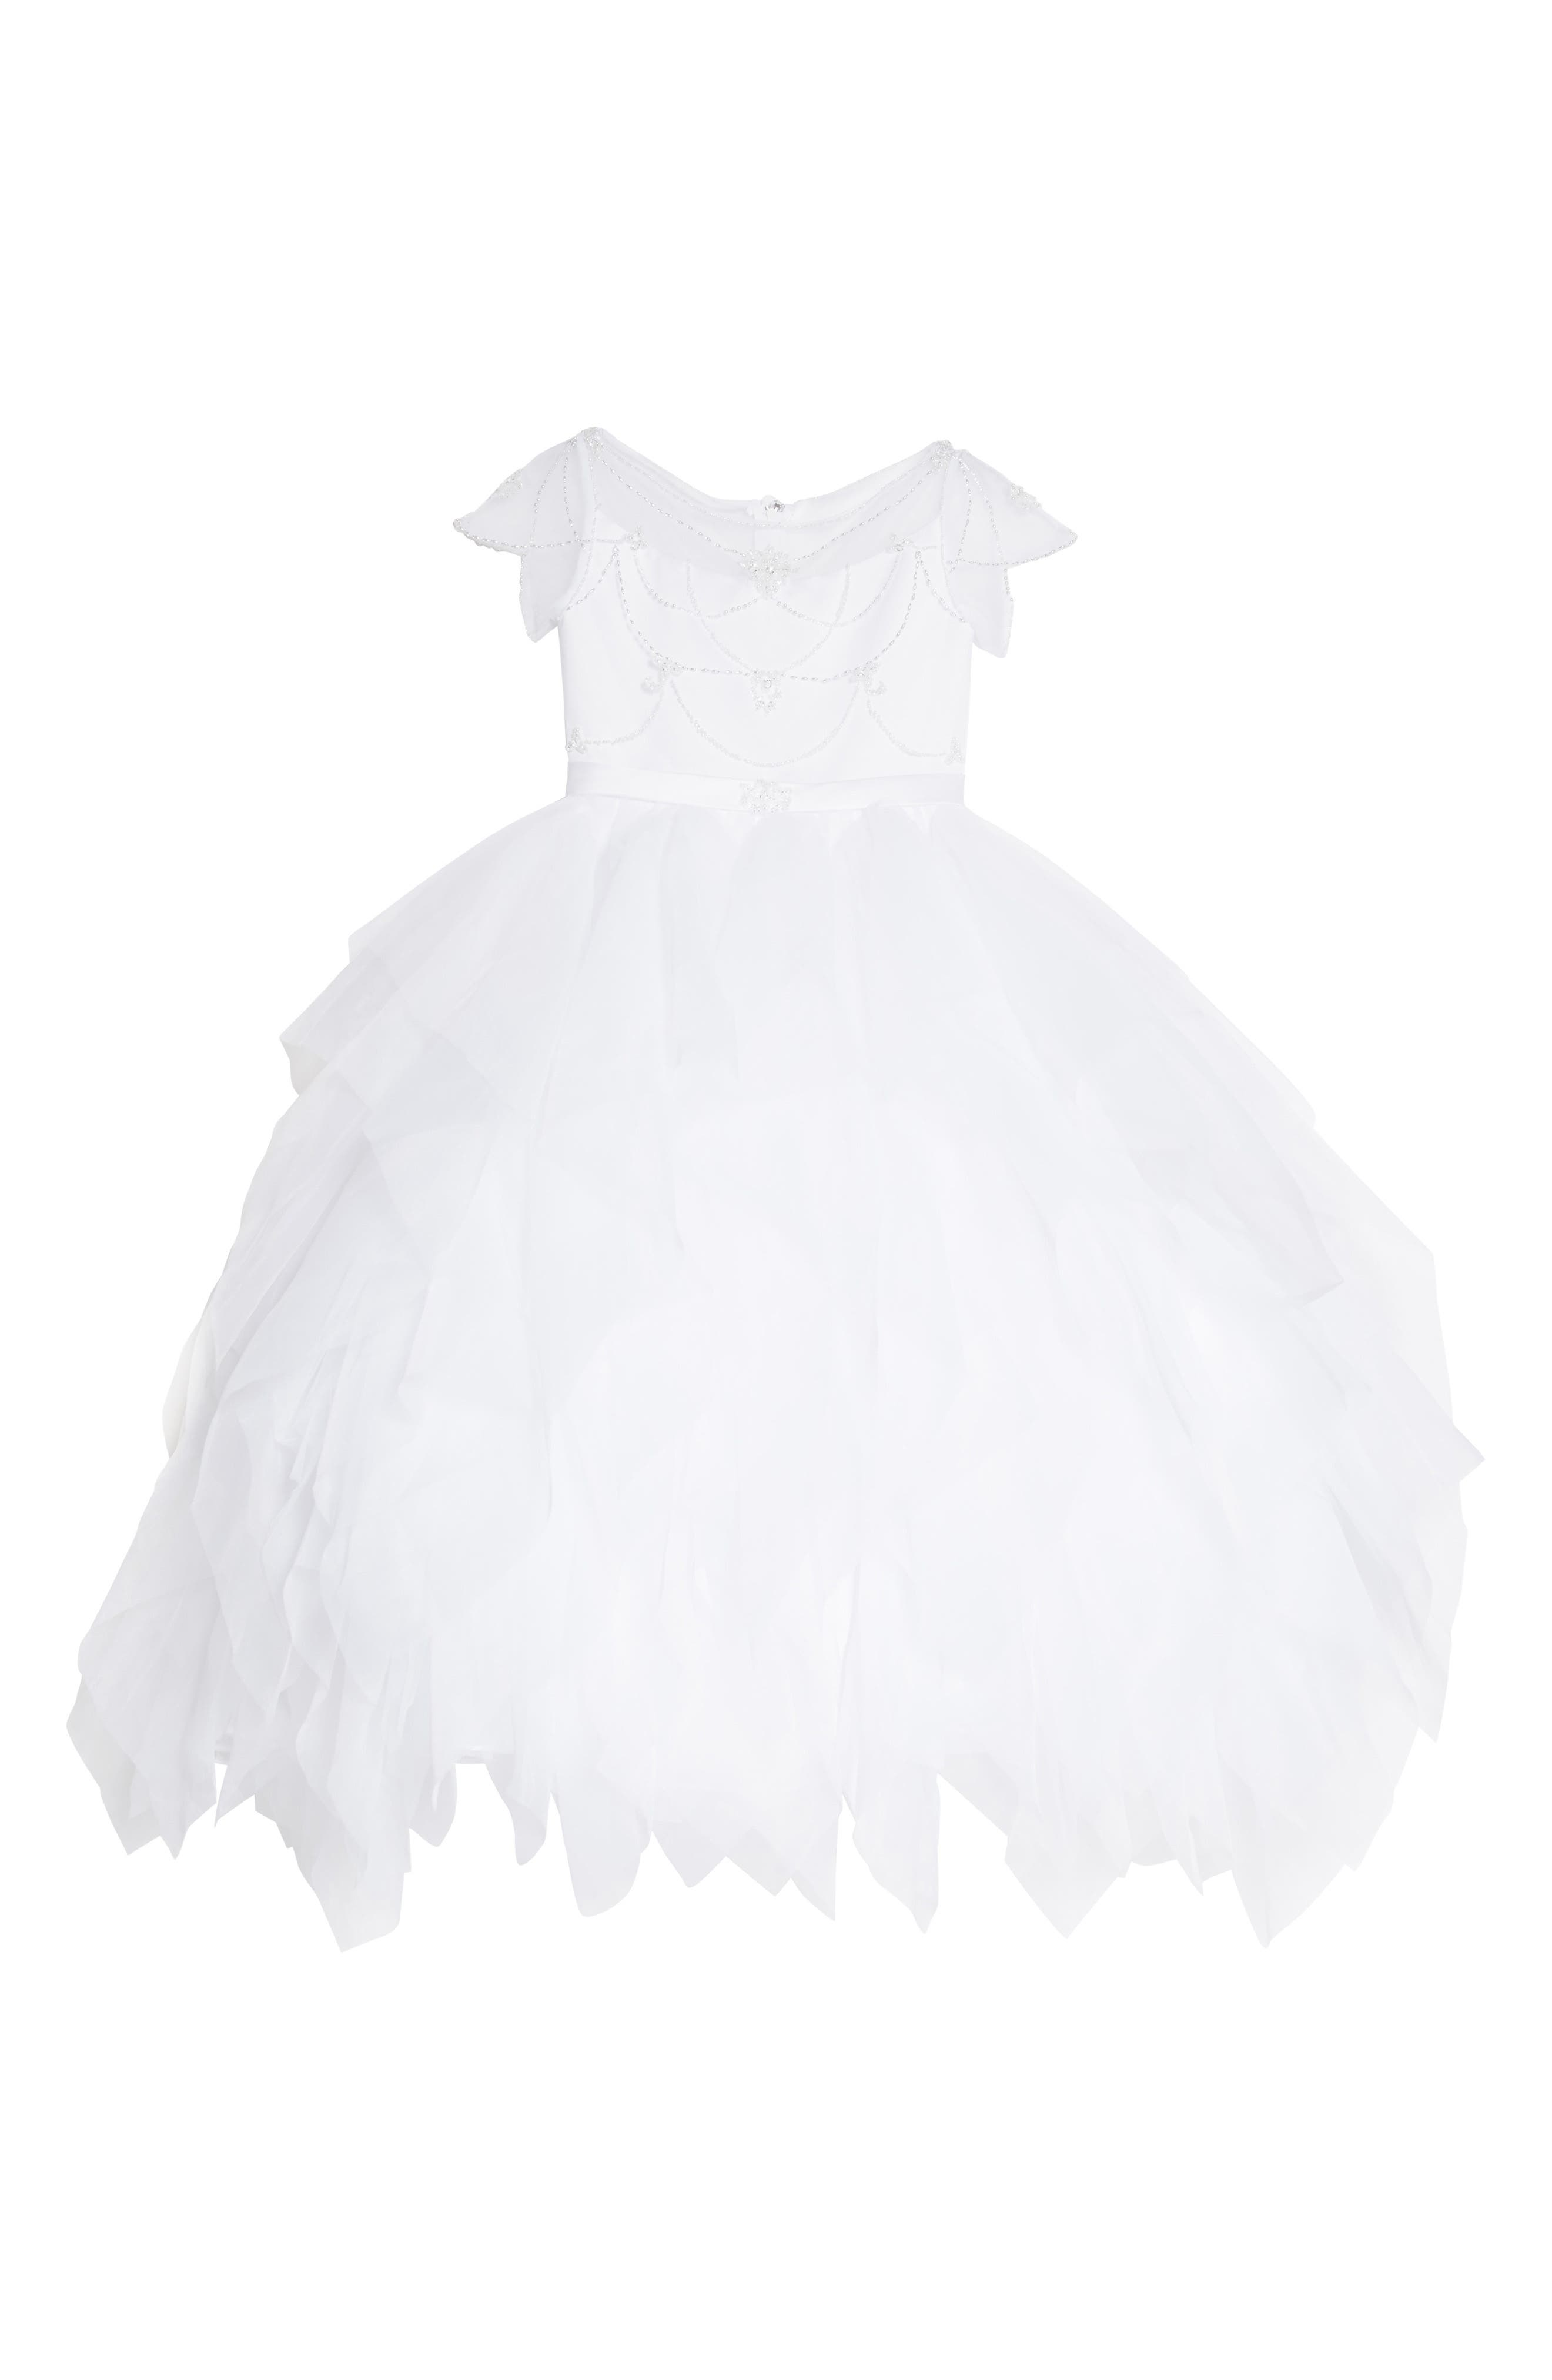 Joan Calabrese for Mon Cheri Beaded Organza & Tulle First Communion Dress (Little Girls & Big Girls)